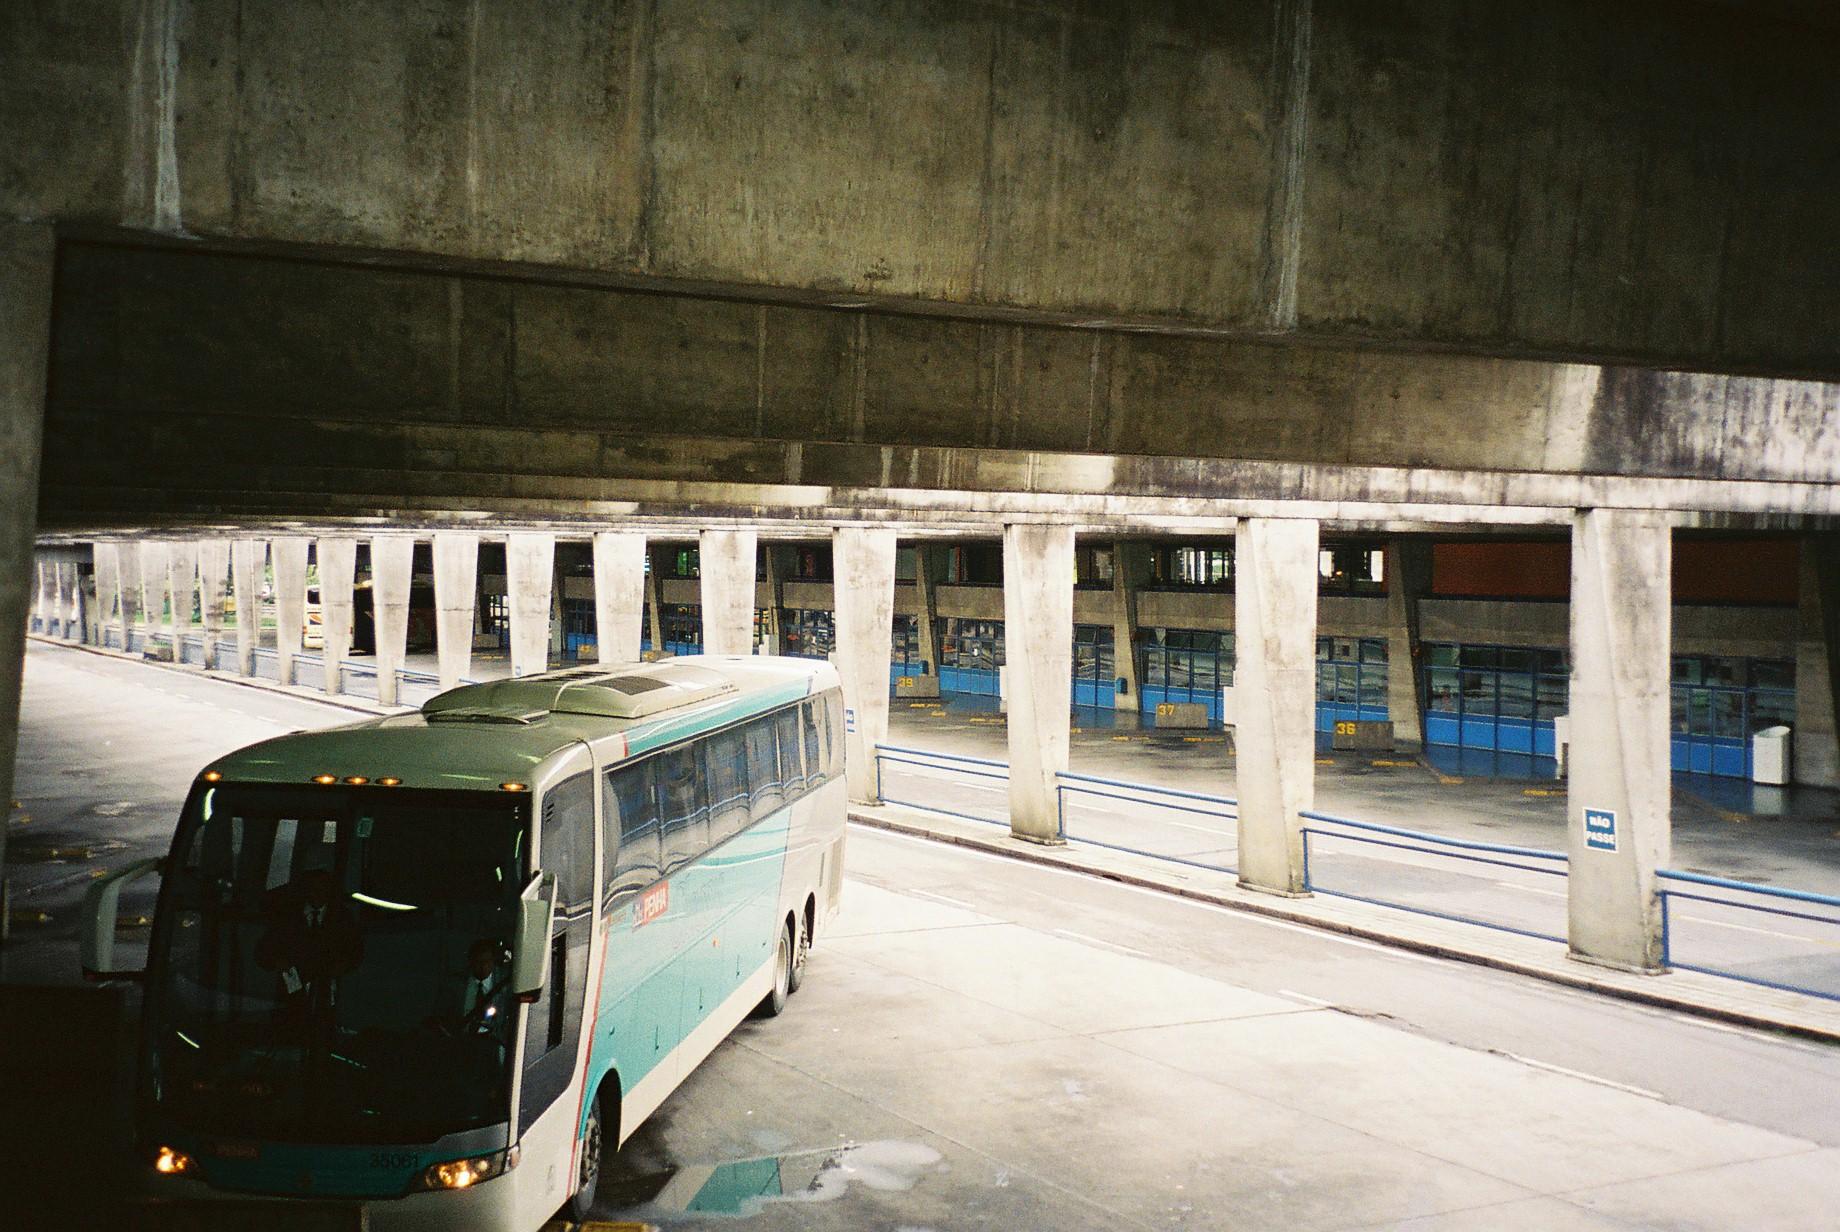 curitiba rodoferroviaria bus parking jul08